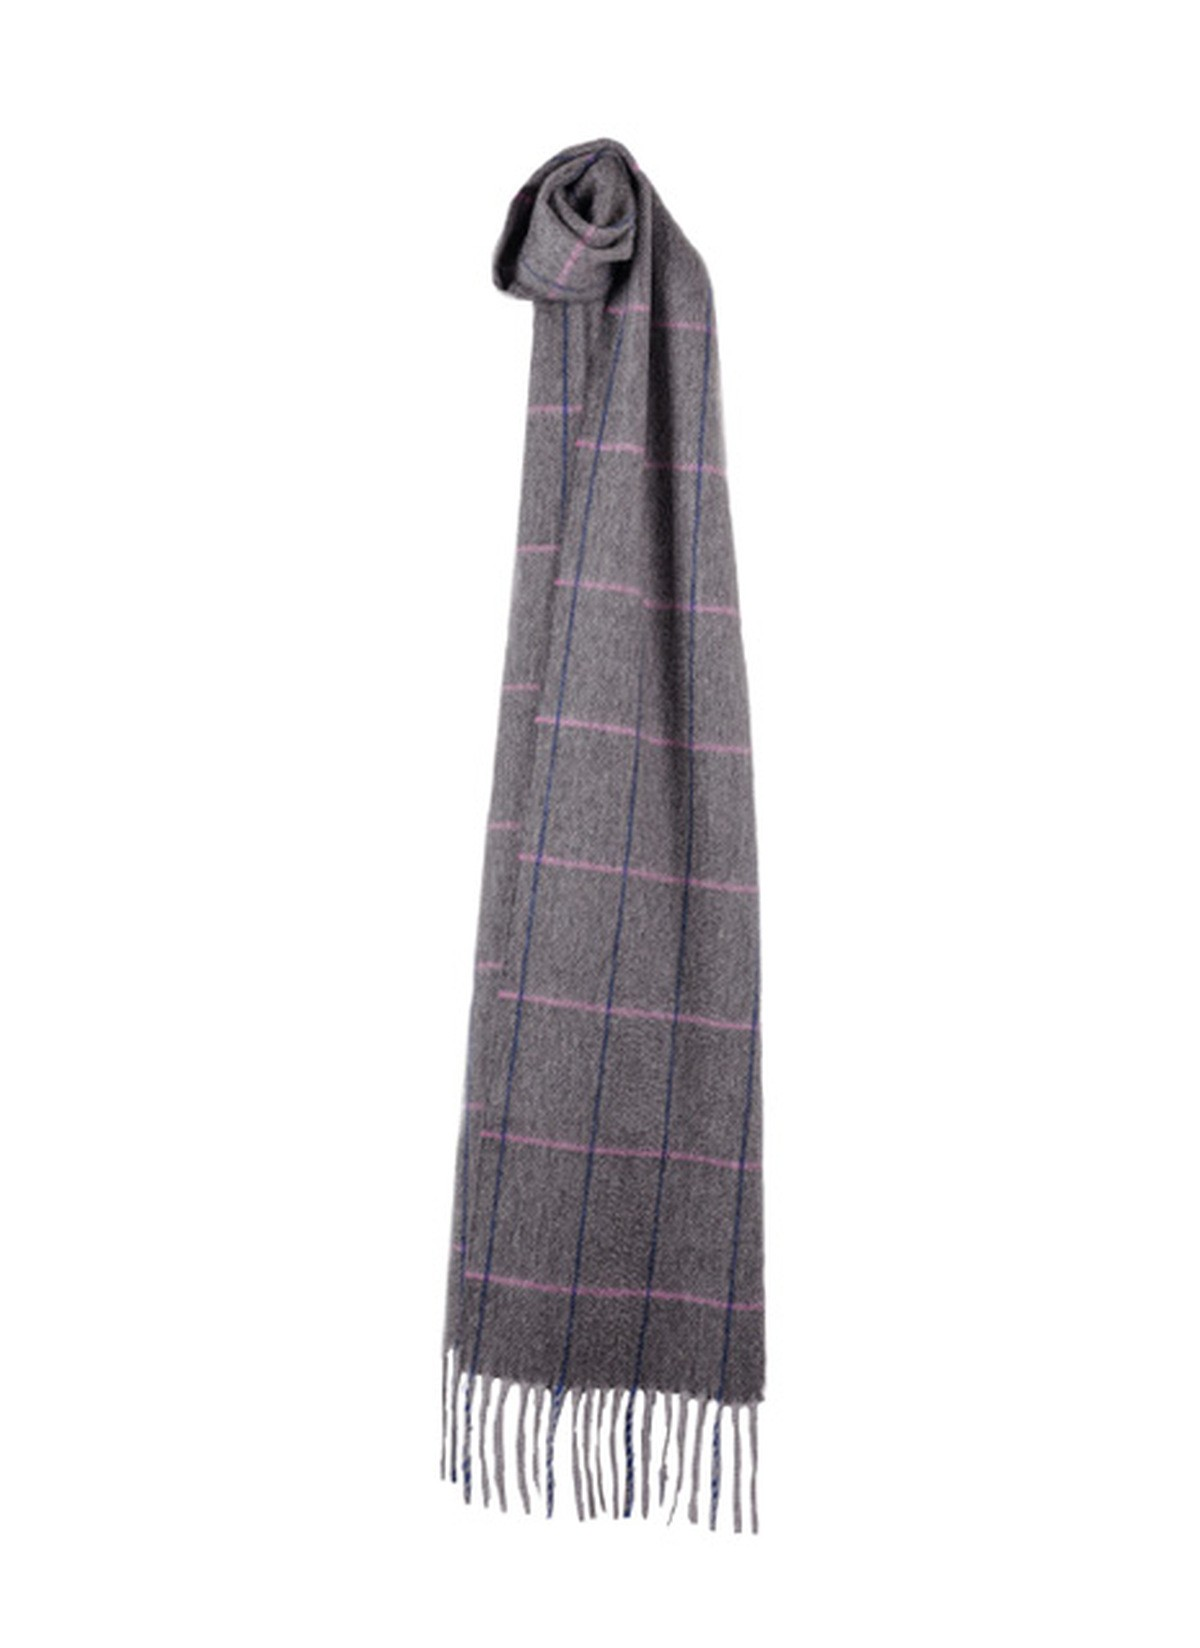 Sinclair Duncan Herringbone Woven Cashmere Scarf - Dark Grey